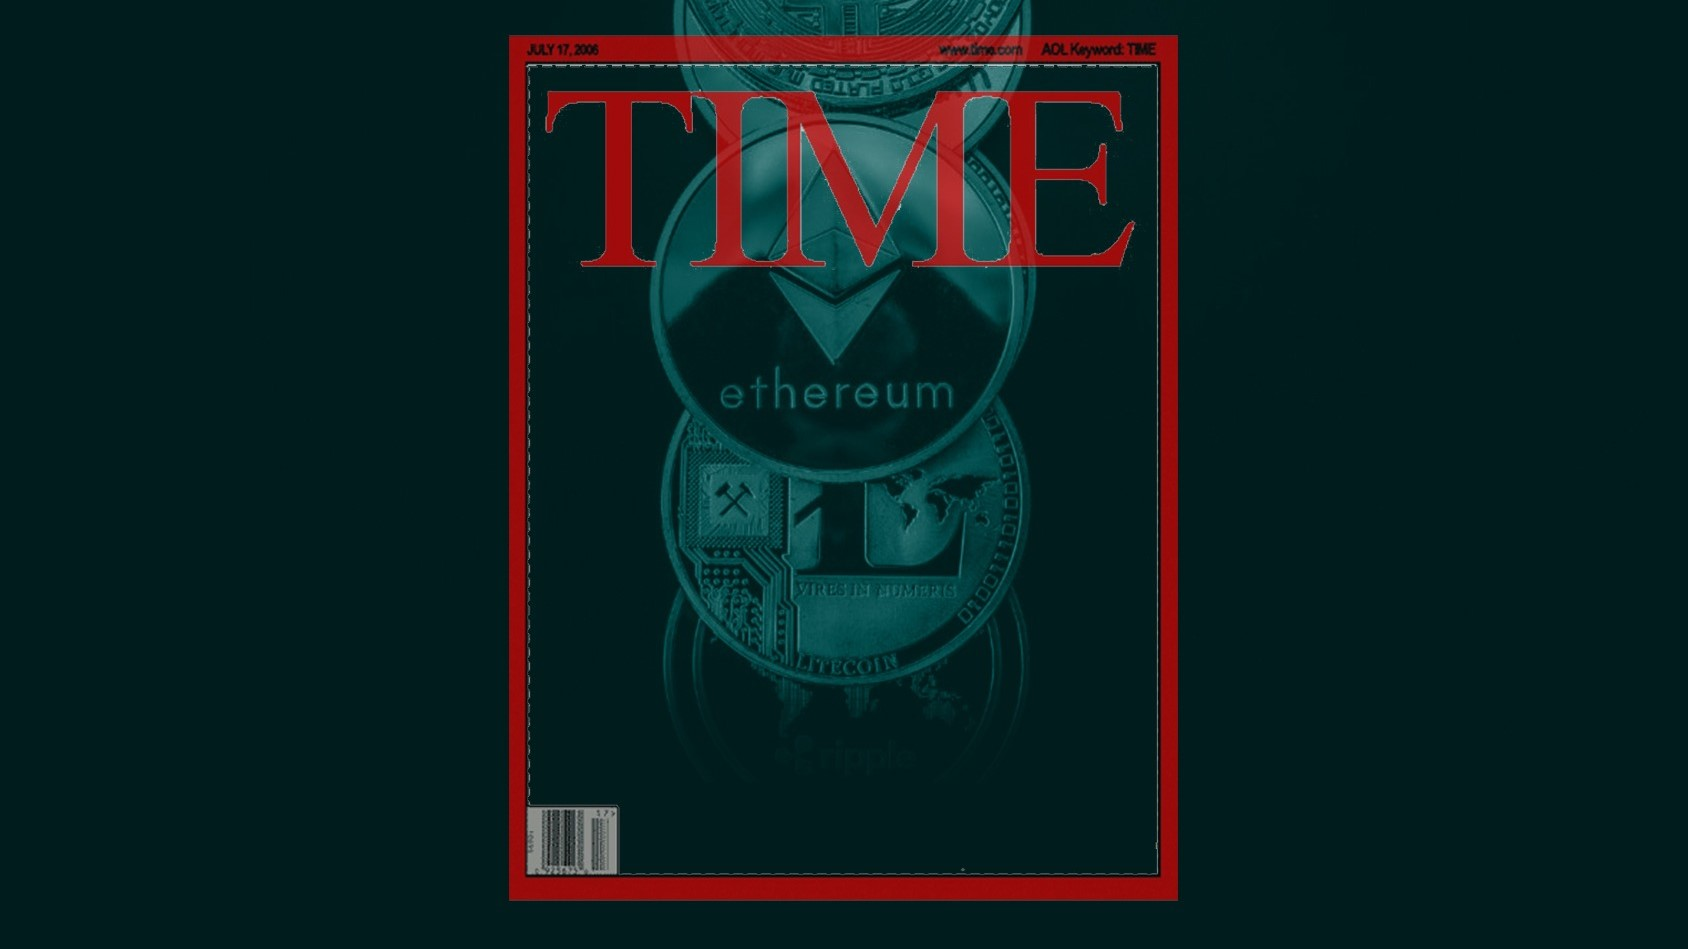 La revista TIME pagos con criptomonedas